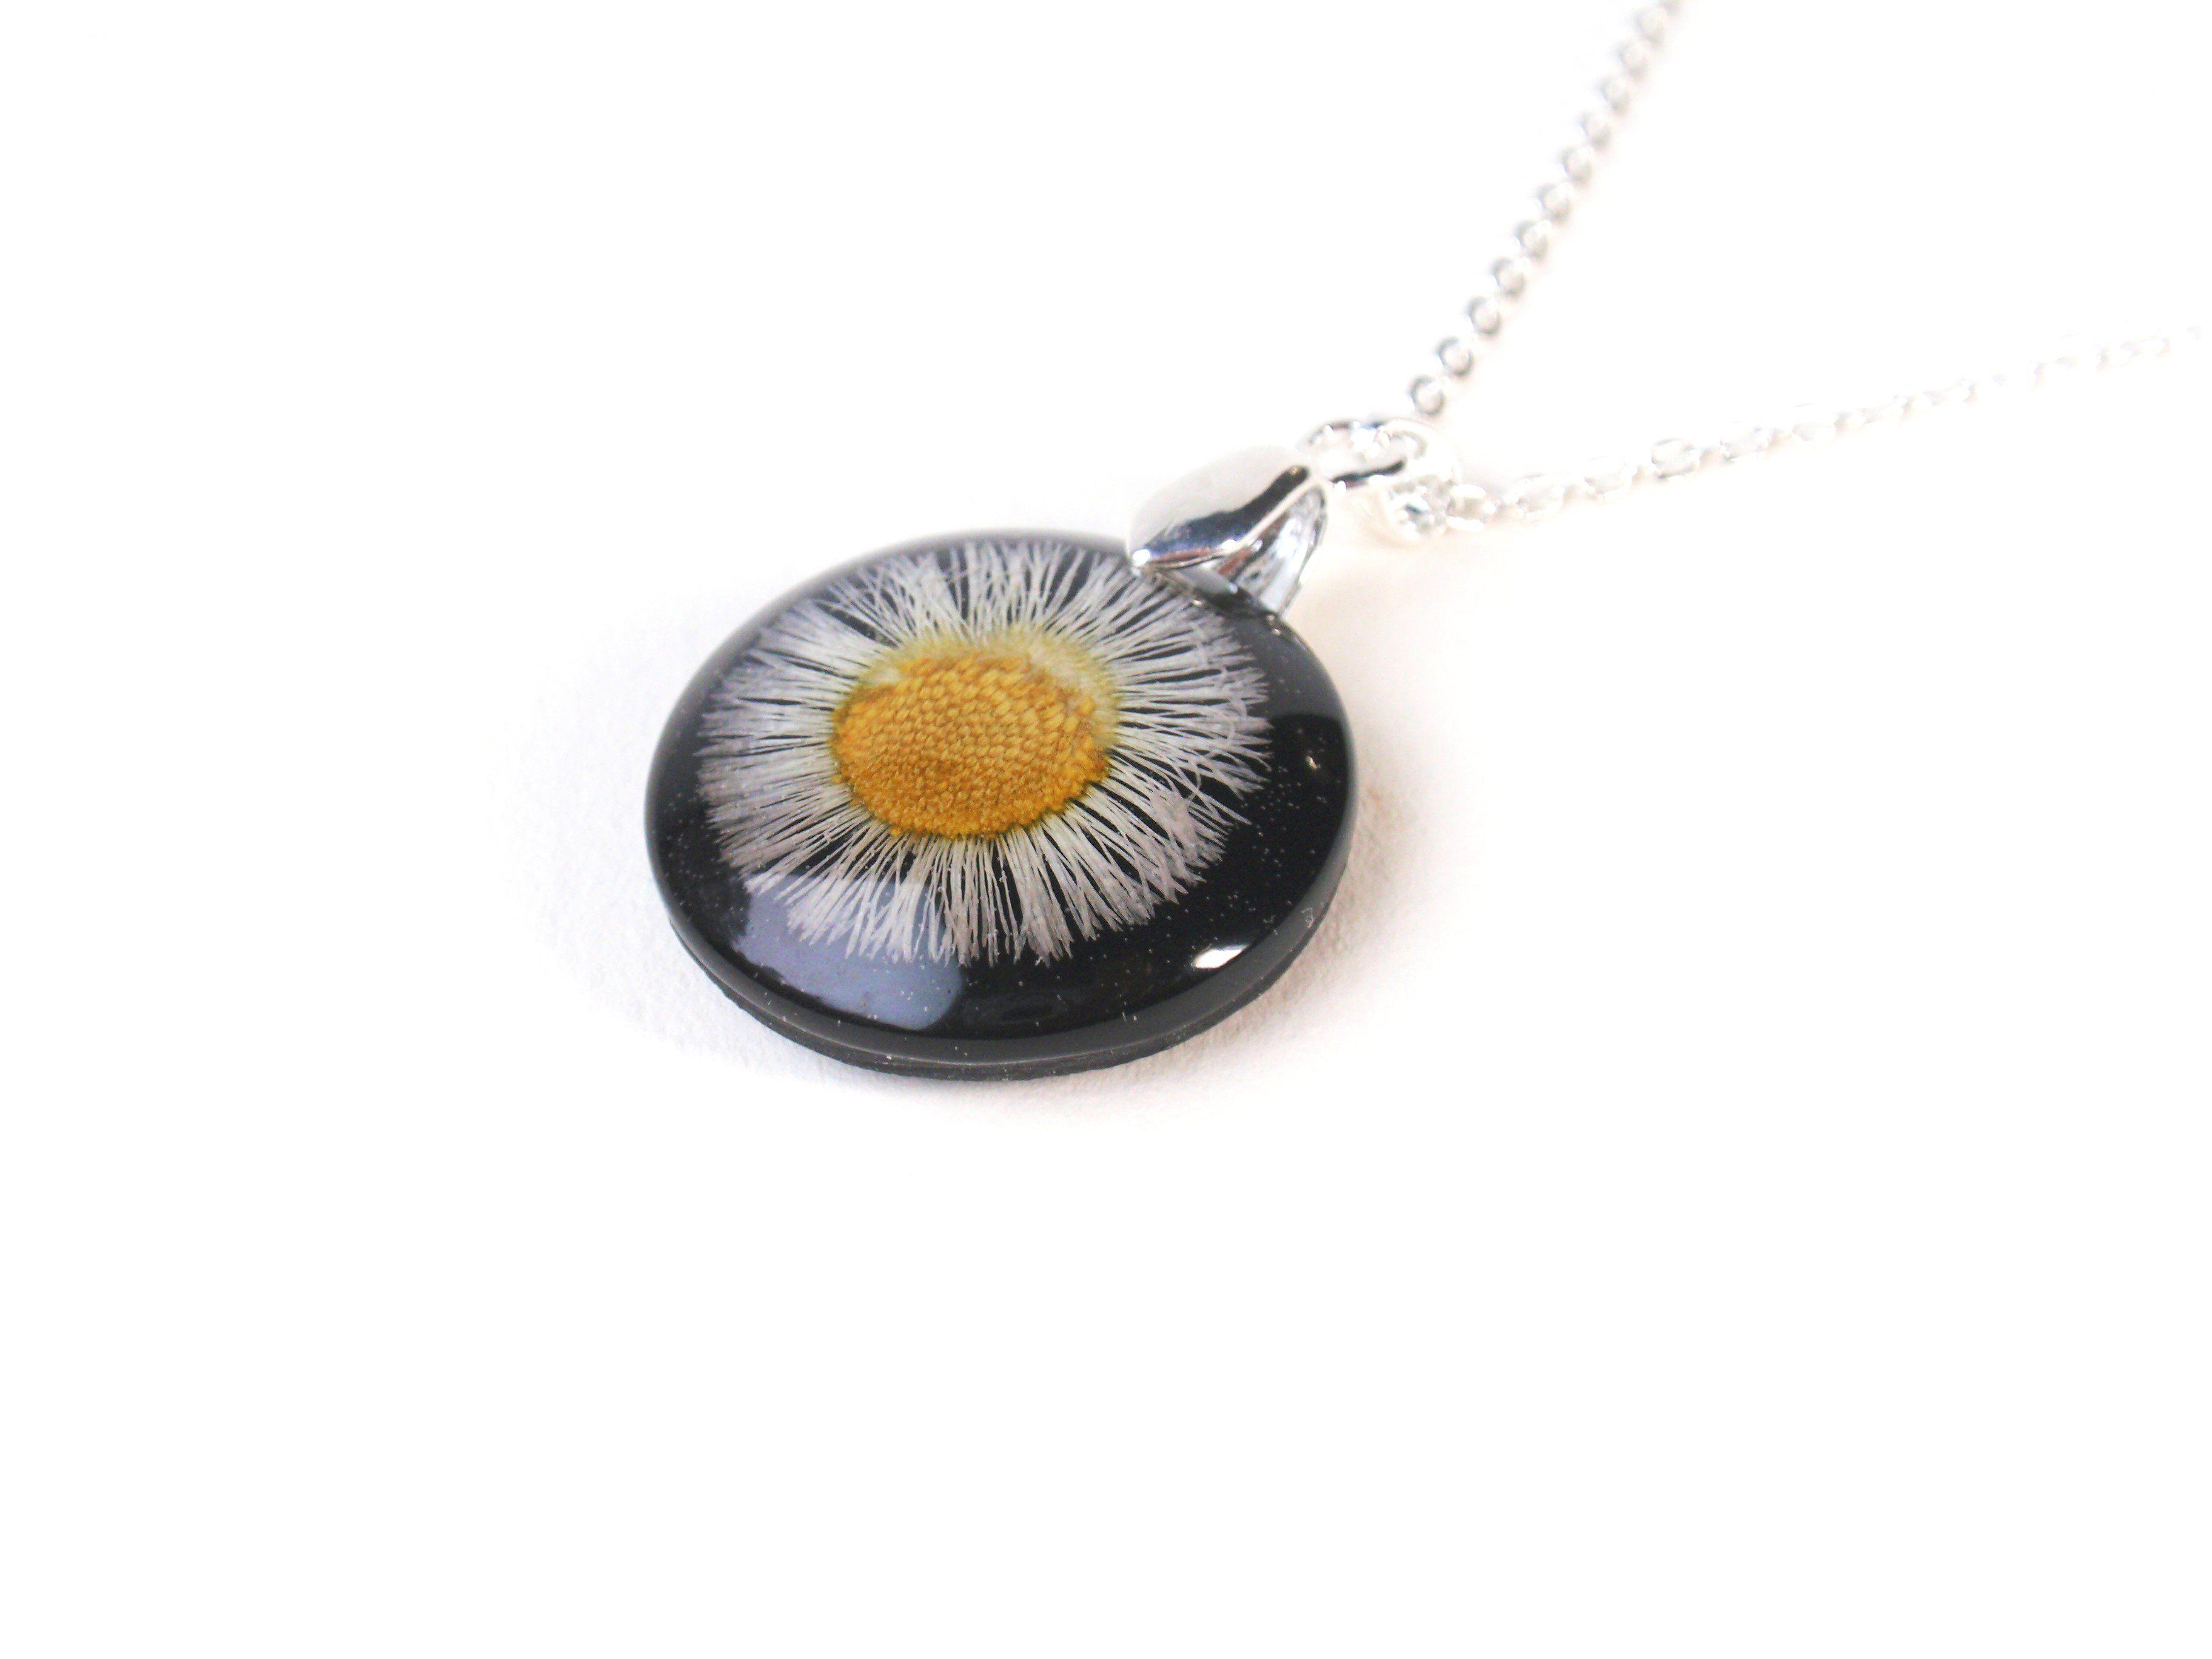 Aster Set Into Black Resin Botanical Pendant September Birth Month Flower Flower Resin Jewelry Flower Jewellery Pendant